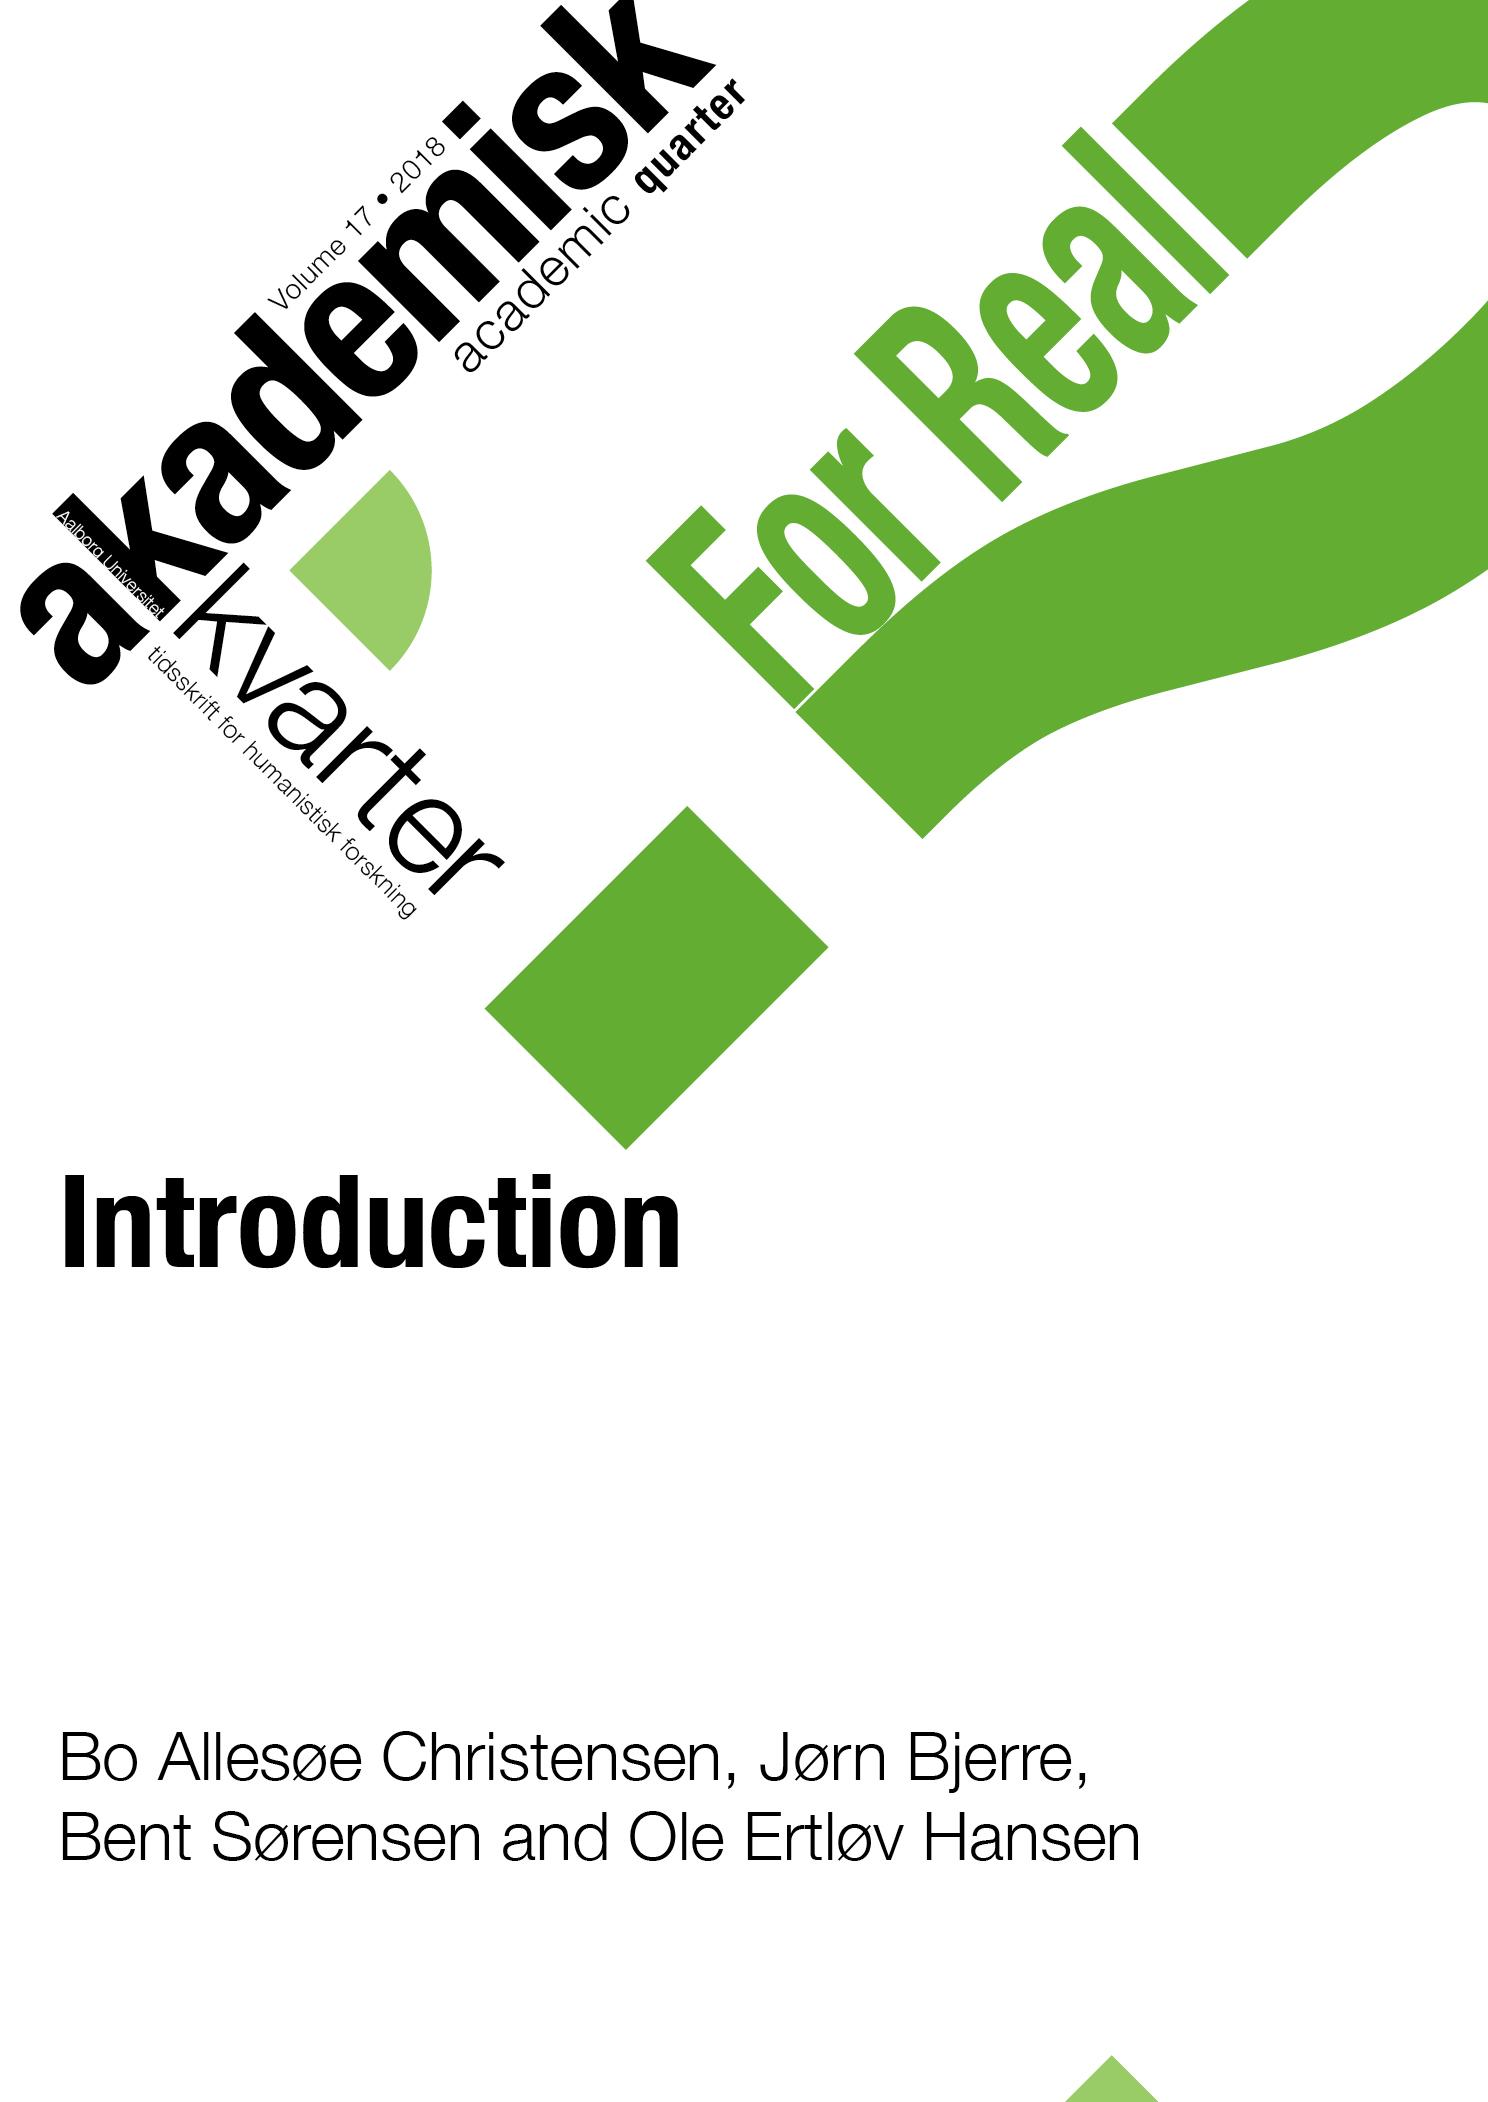 Introduktion | Introduction